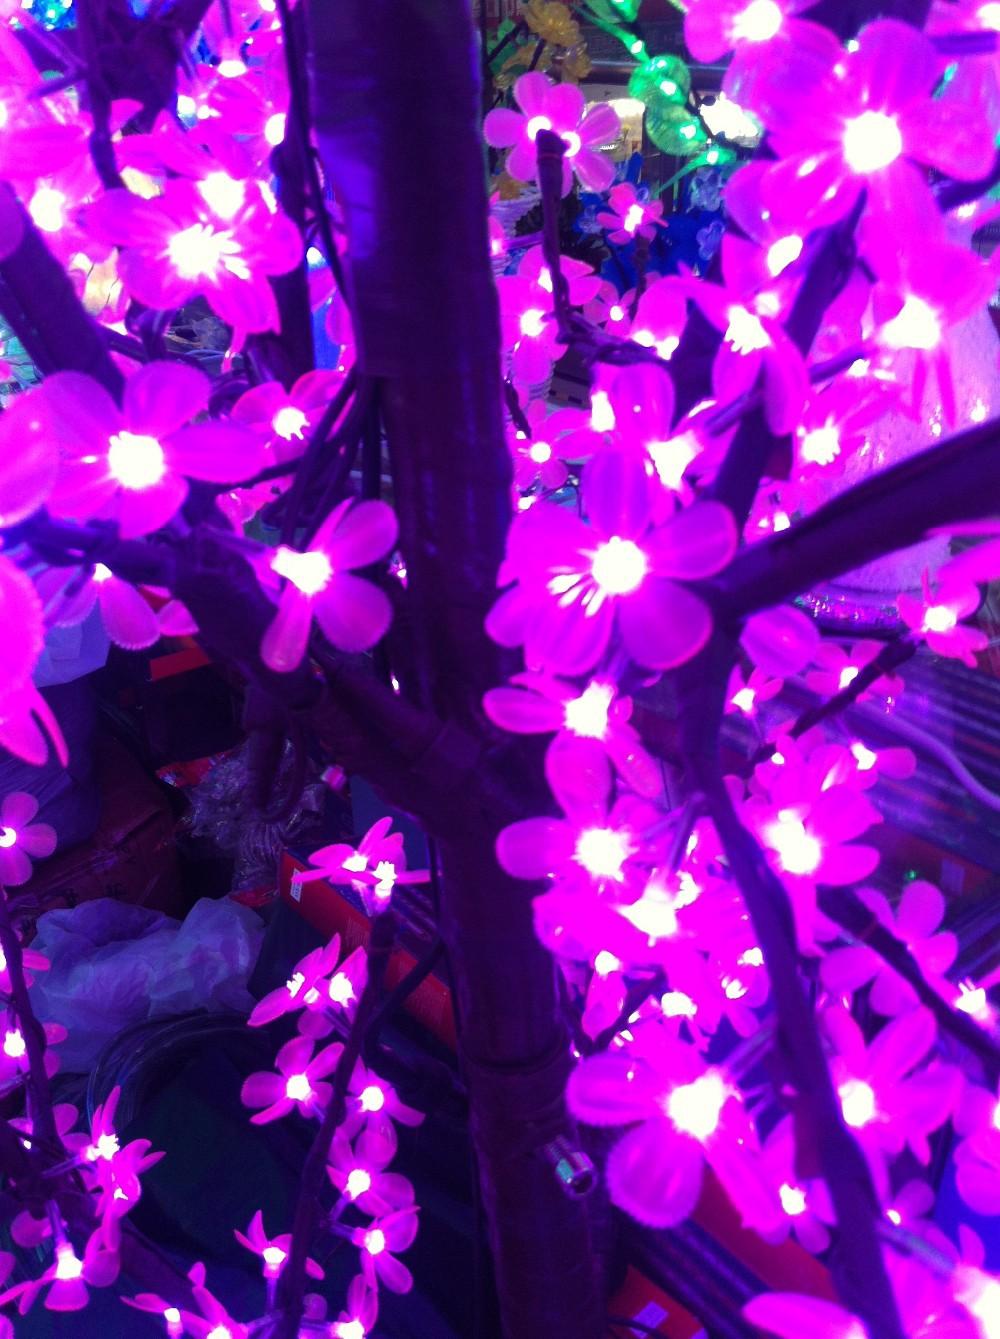 2014 New Holiday Light Christmas Decoration Lights Luxury Handmade Drtificial led Cherry Blossom Tree Light 250cm 1200 Light (7)